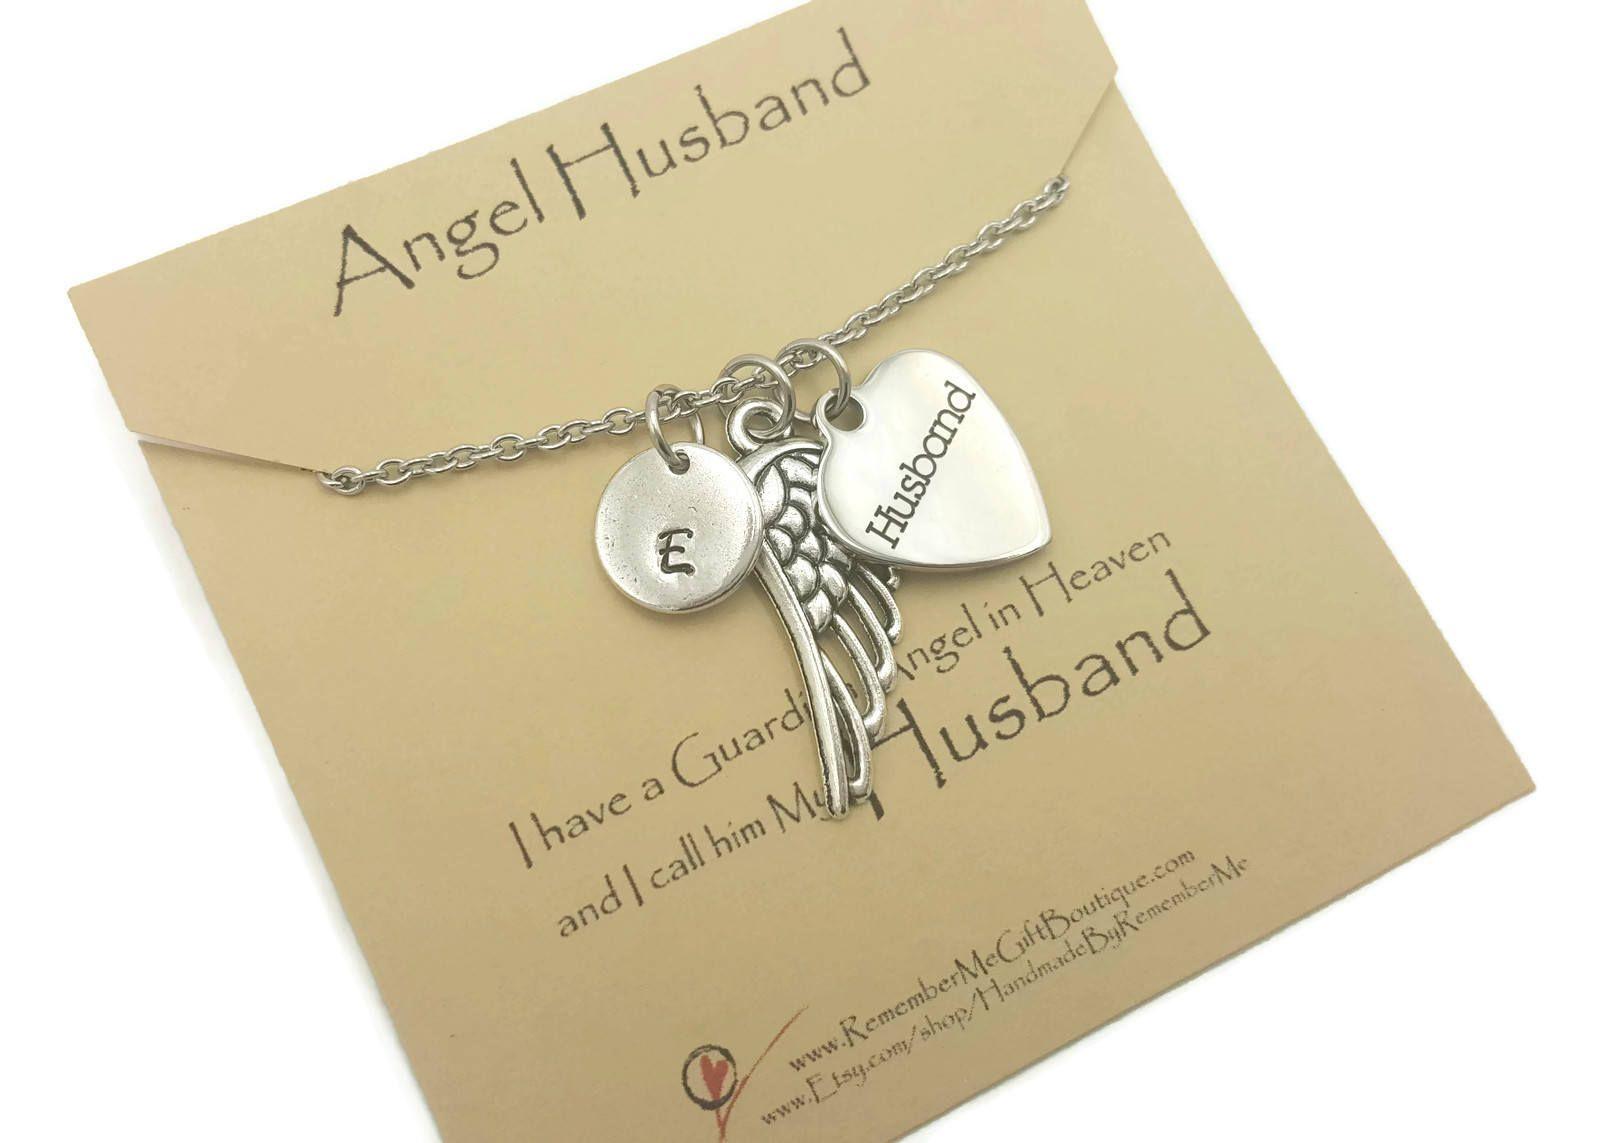 Loss of husband in memory gifts sympathy gift husband